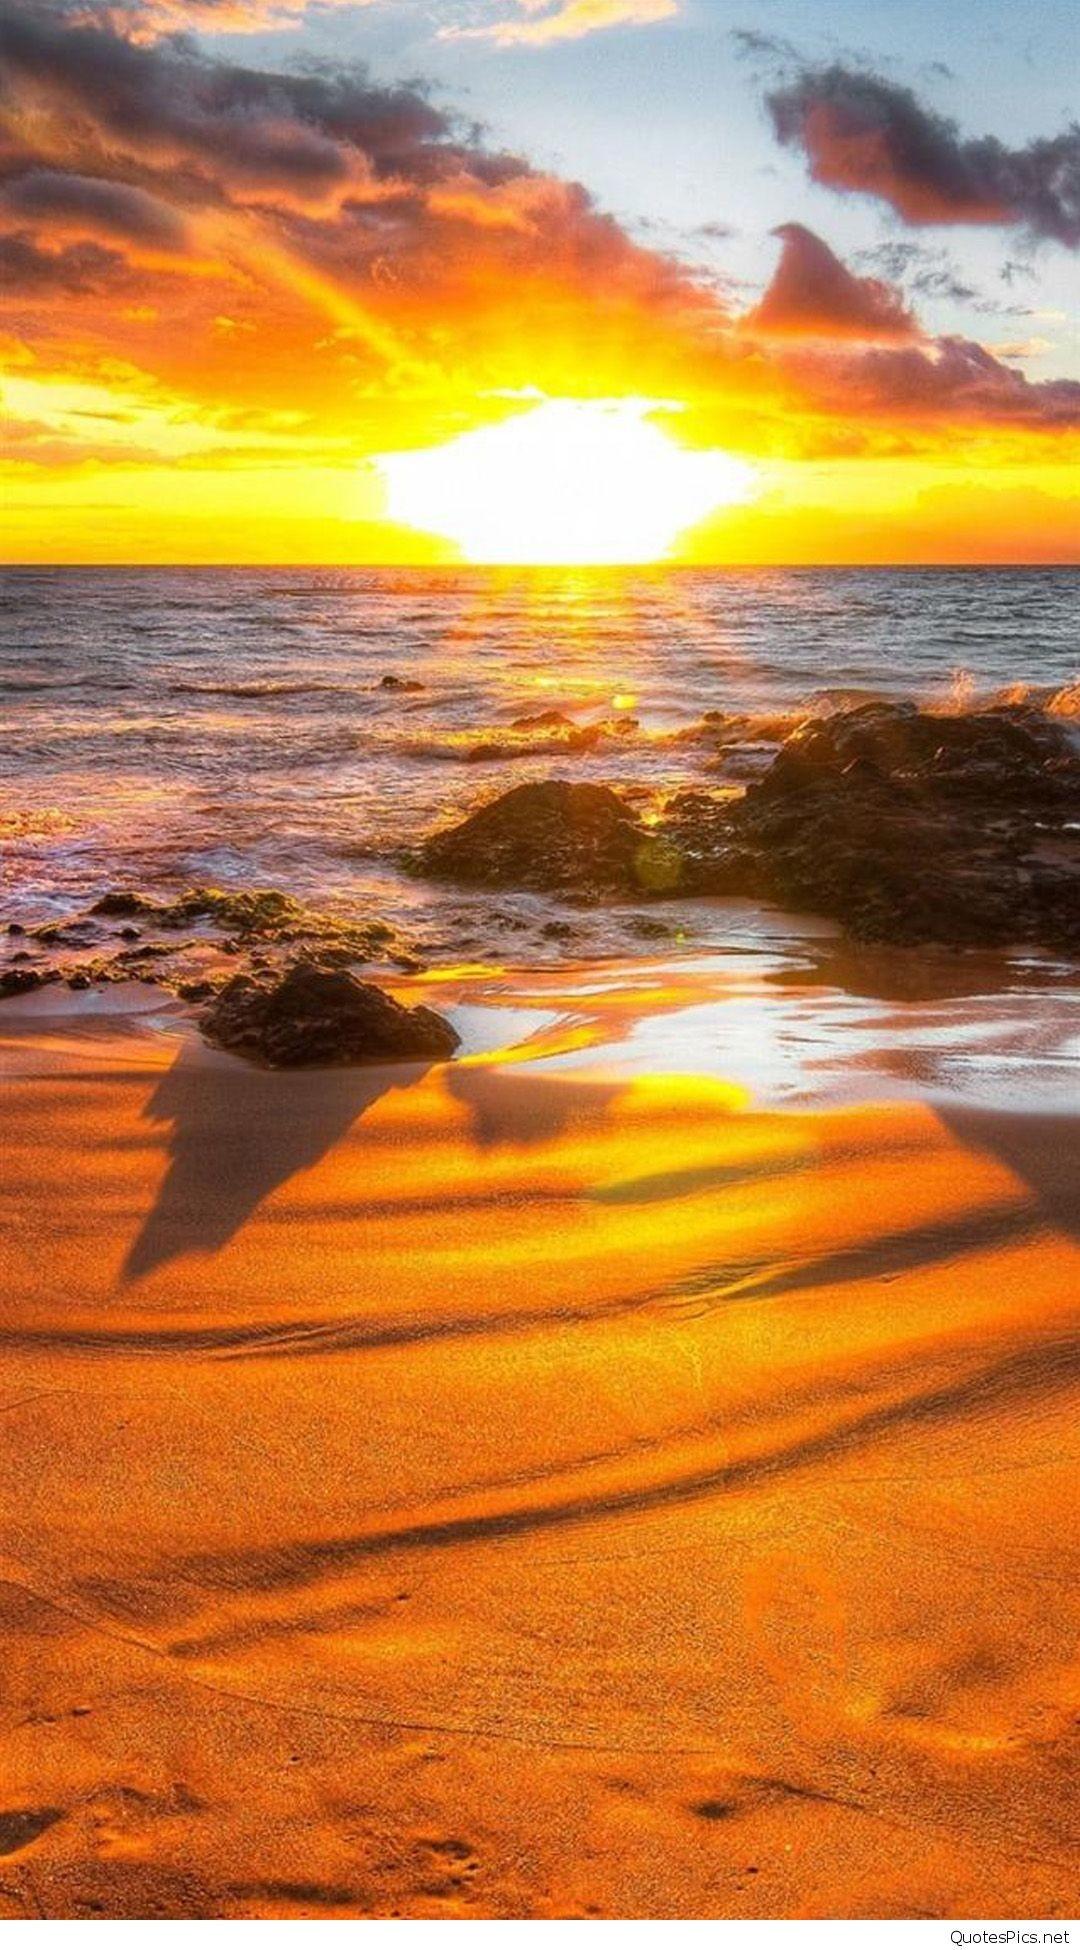 Sunset-HD-Beach-iPhone-Wallpapers